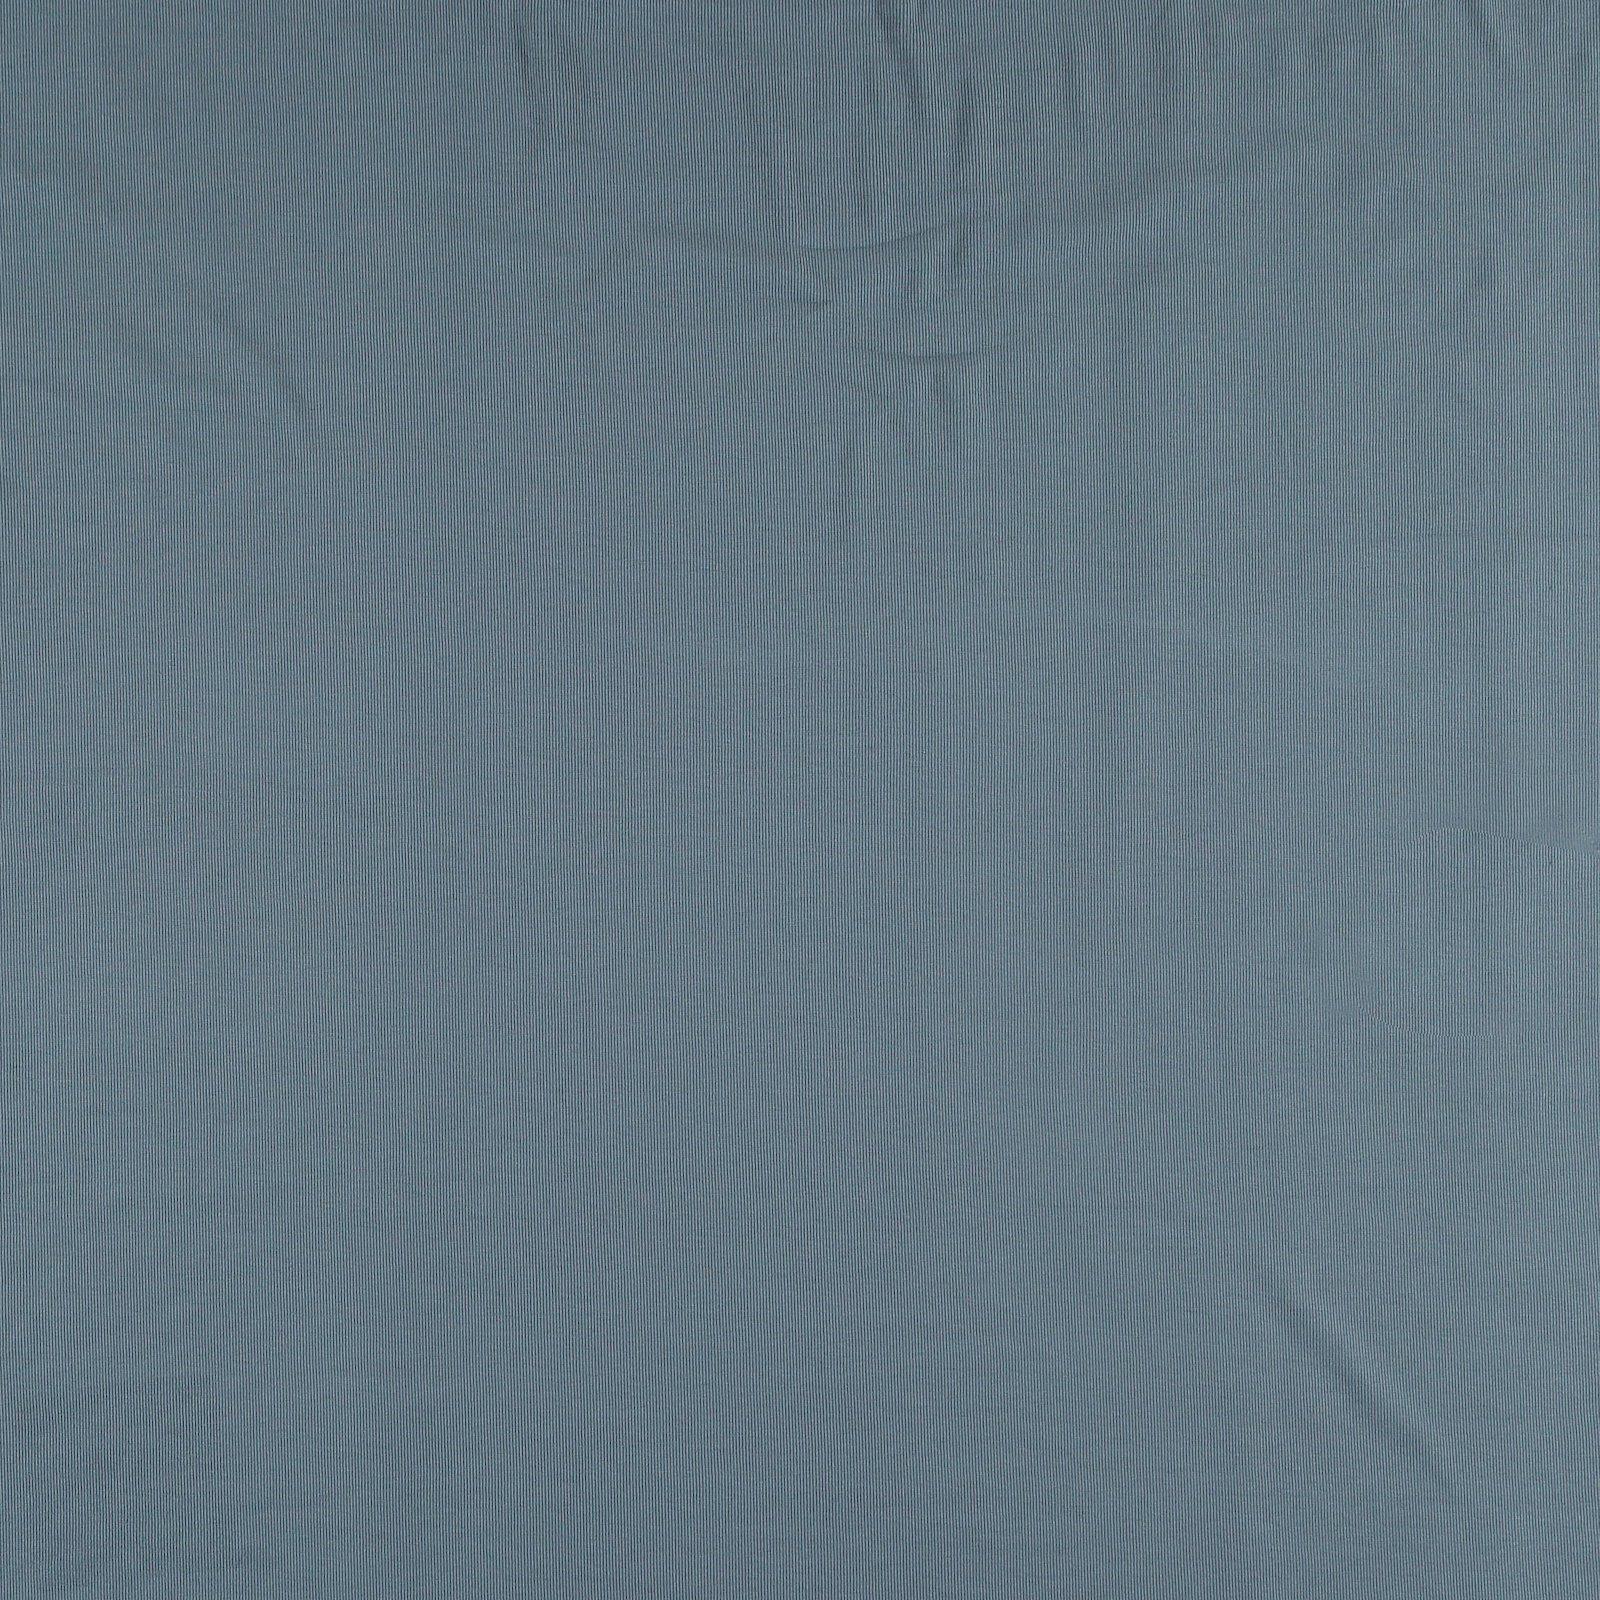 Organic 2x2 rib blue grey 272778_pack_solid